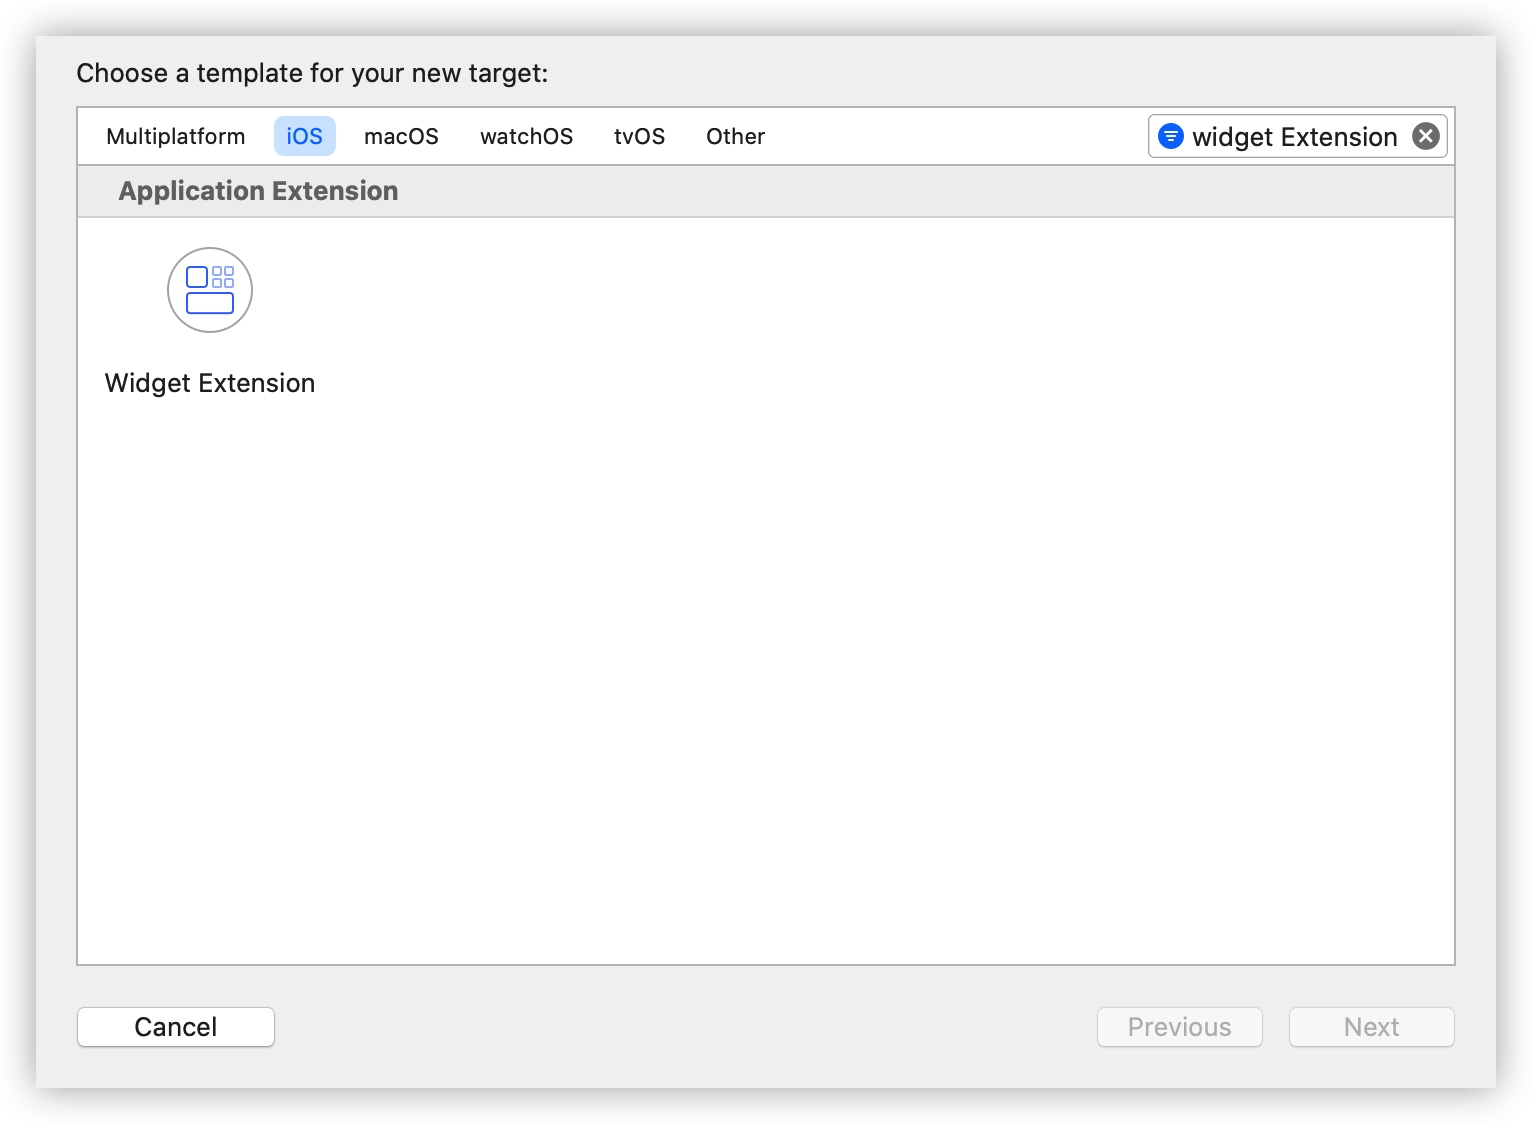 创建 App Extension 第一步